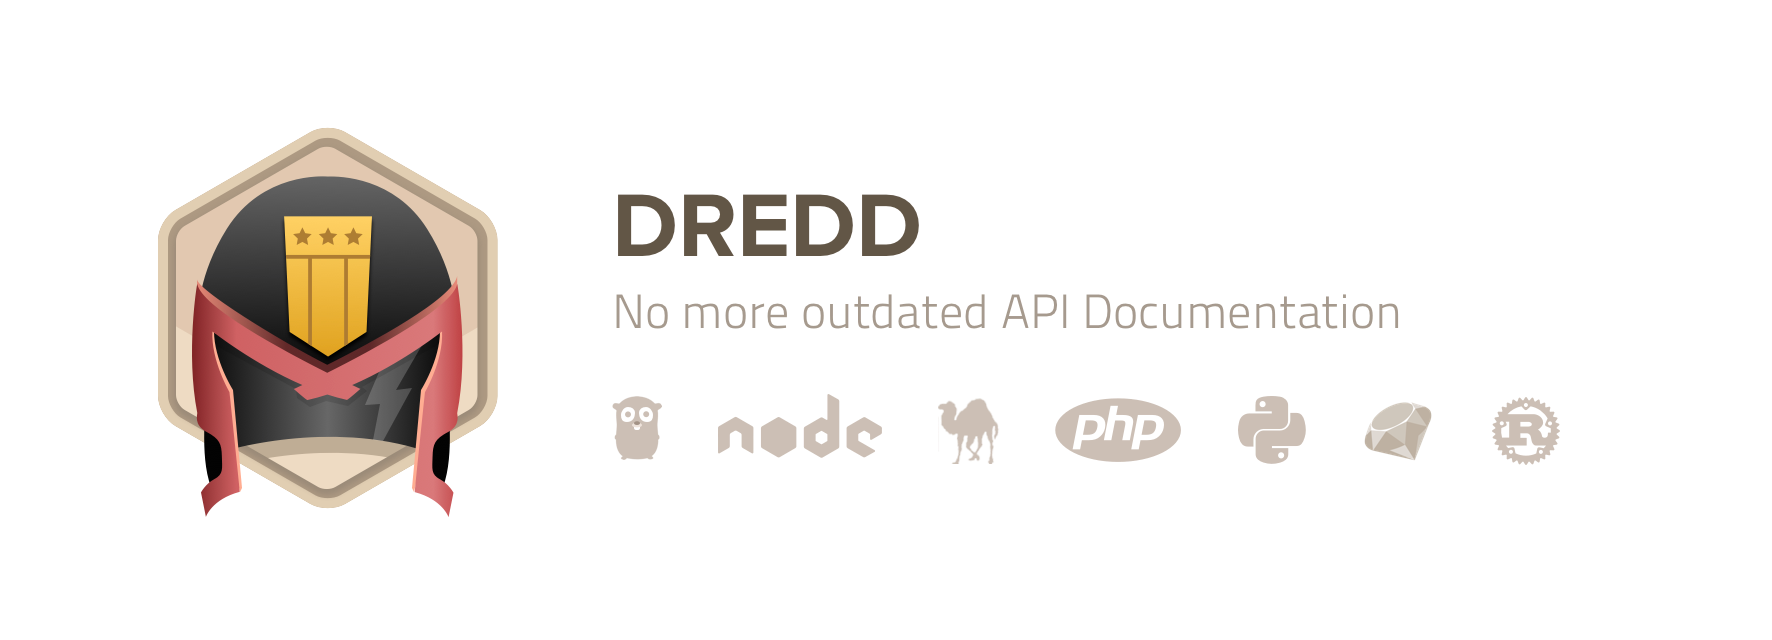 Dredd — HTTP API Testing Framework — Dredd latest documentation